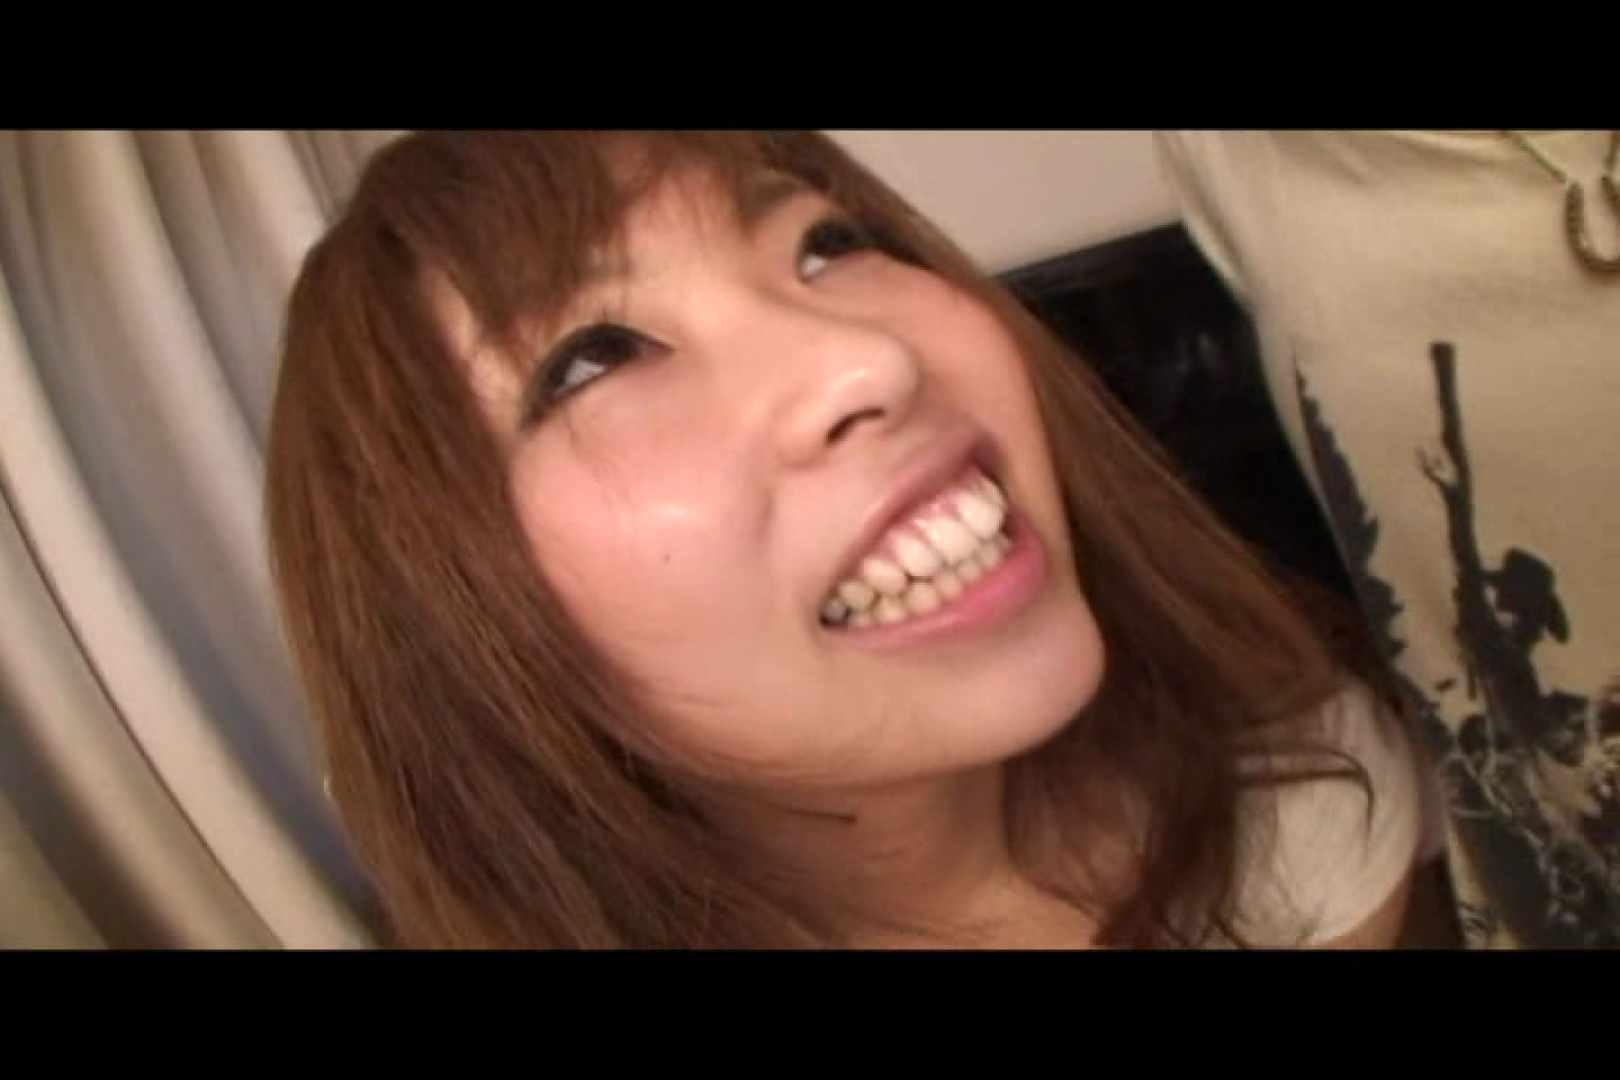 JDハンター全国ツアー vol.050 後編 女子大生のエロ生活   OLのエロ生活  93連発 29